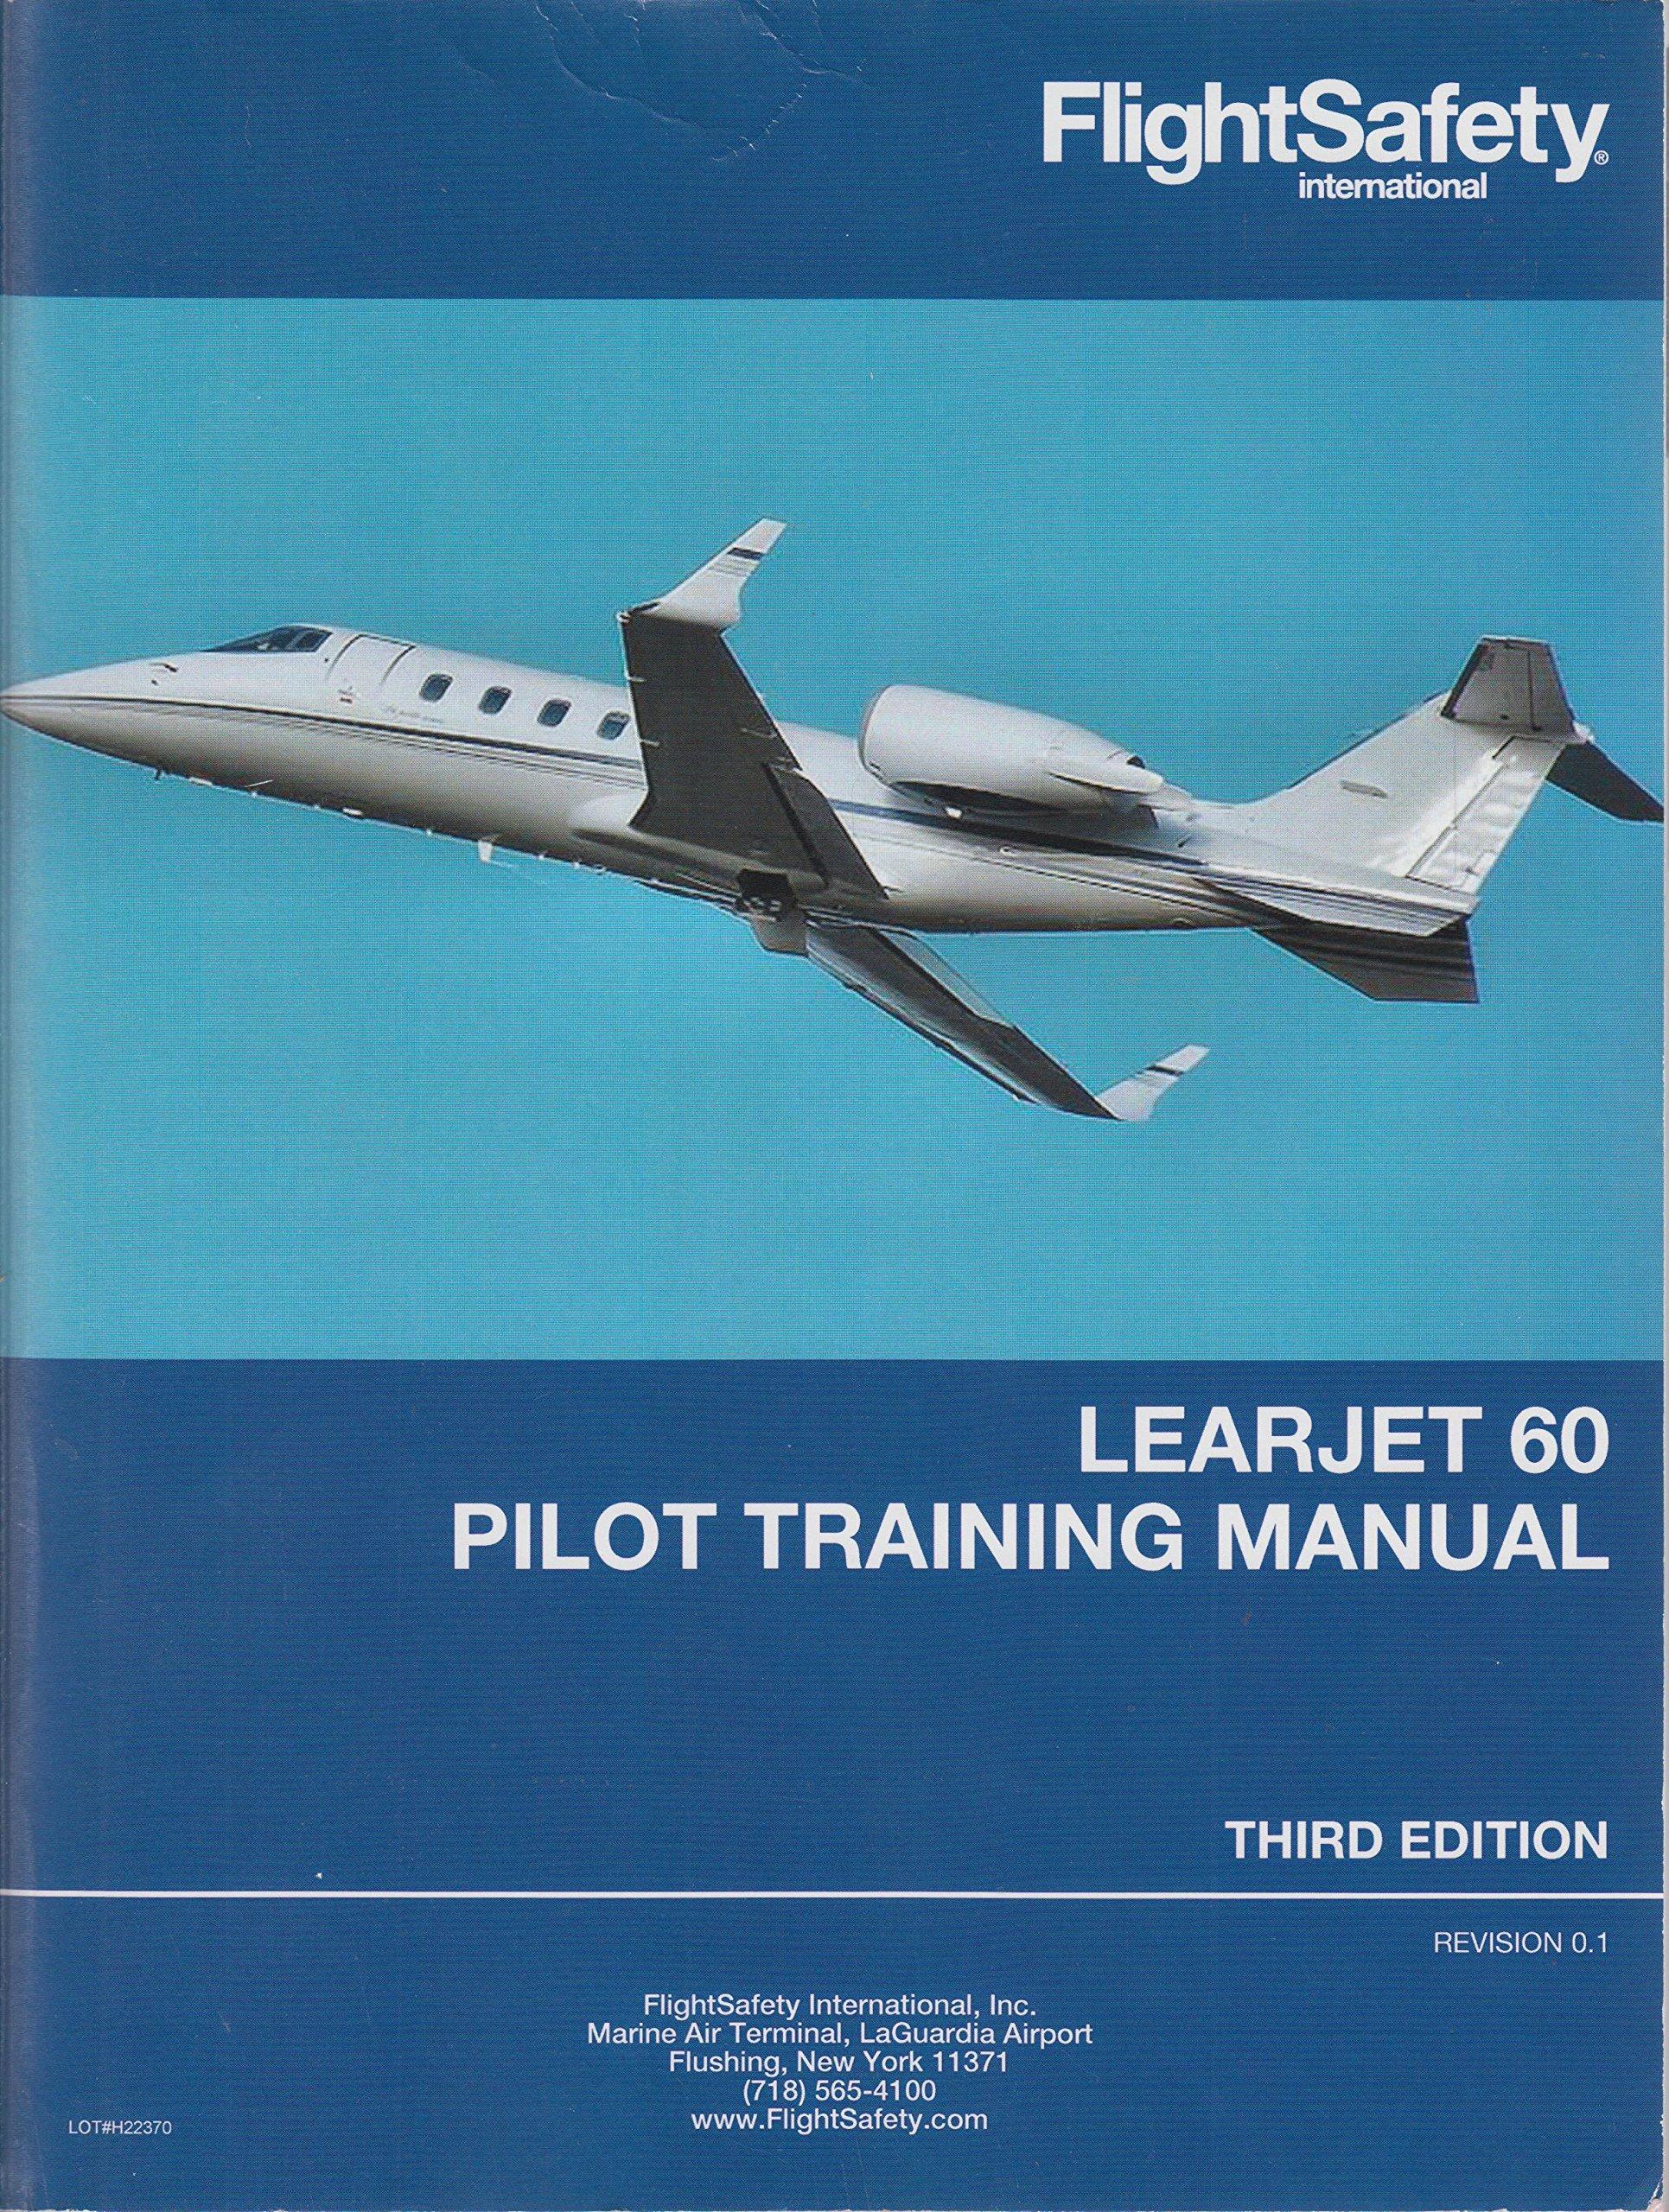 learjet 60 pilot training manual flight safety international rh amazon com airplane flight manual learjet 35a learjet flight manual